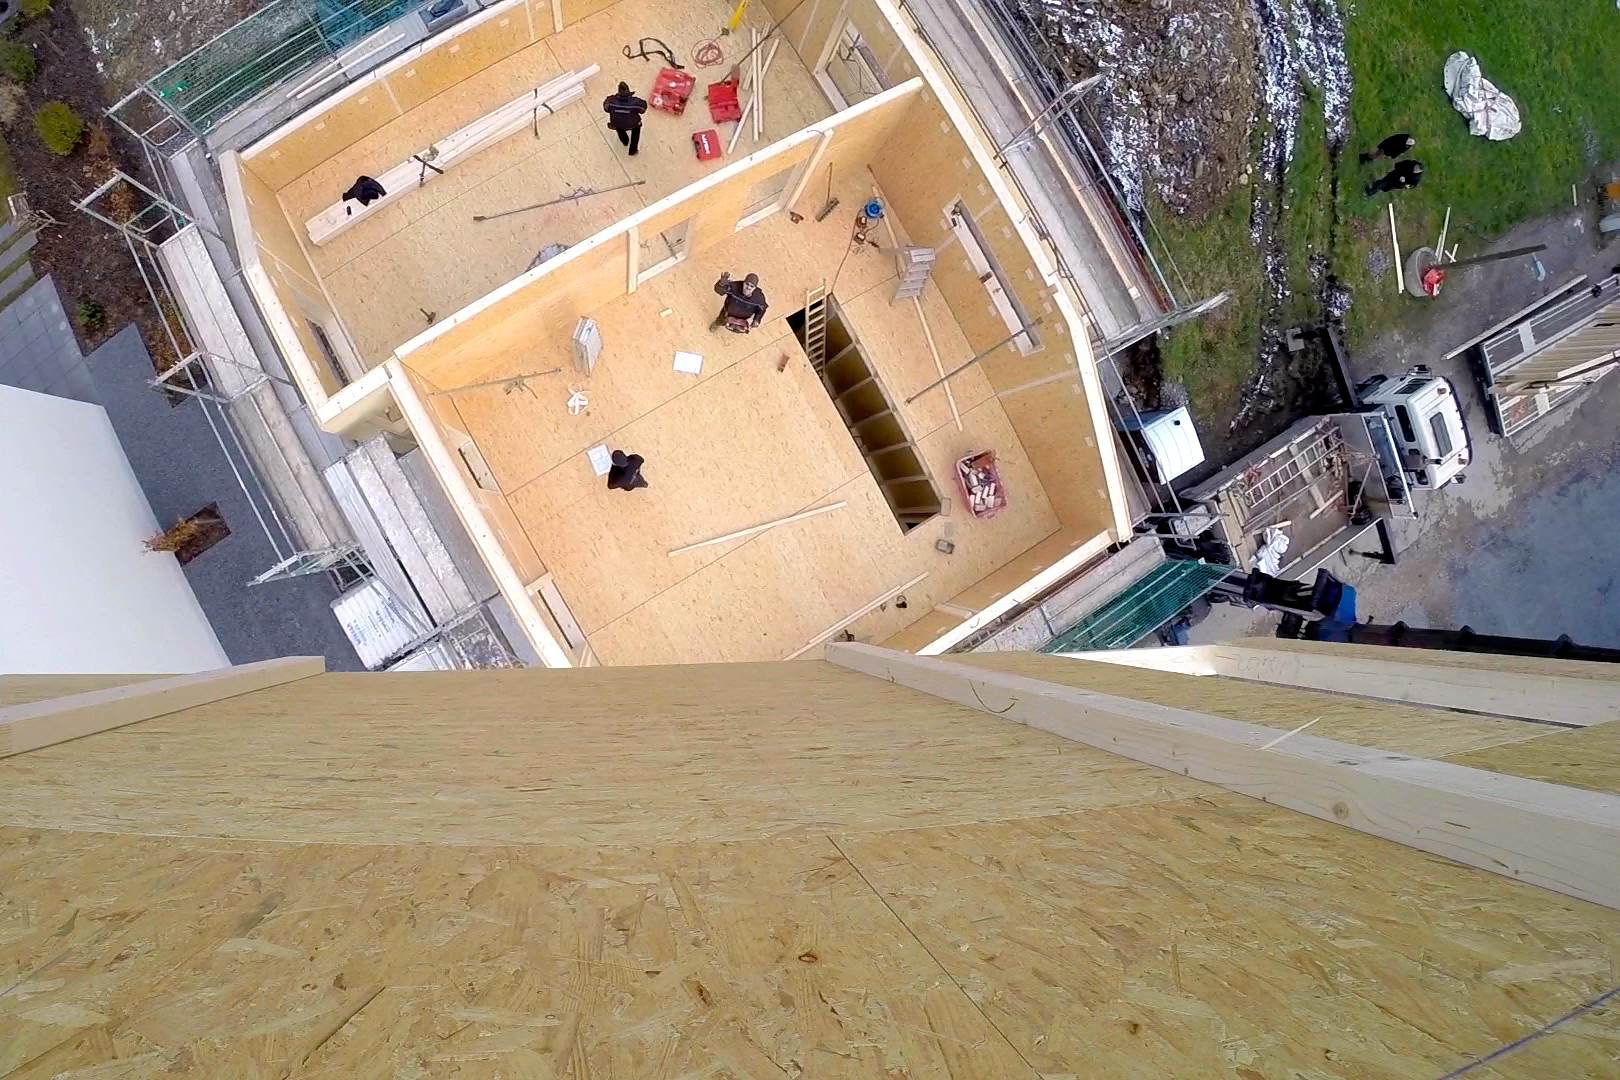 Petershaus_Baublog_8_Vogelperspektive_GoPro_Kran_Obergeschoss